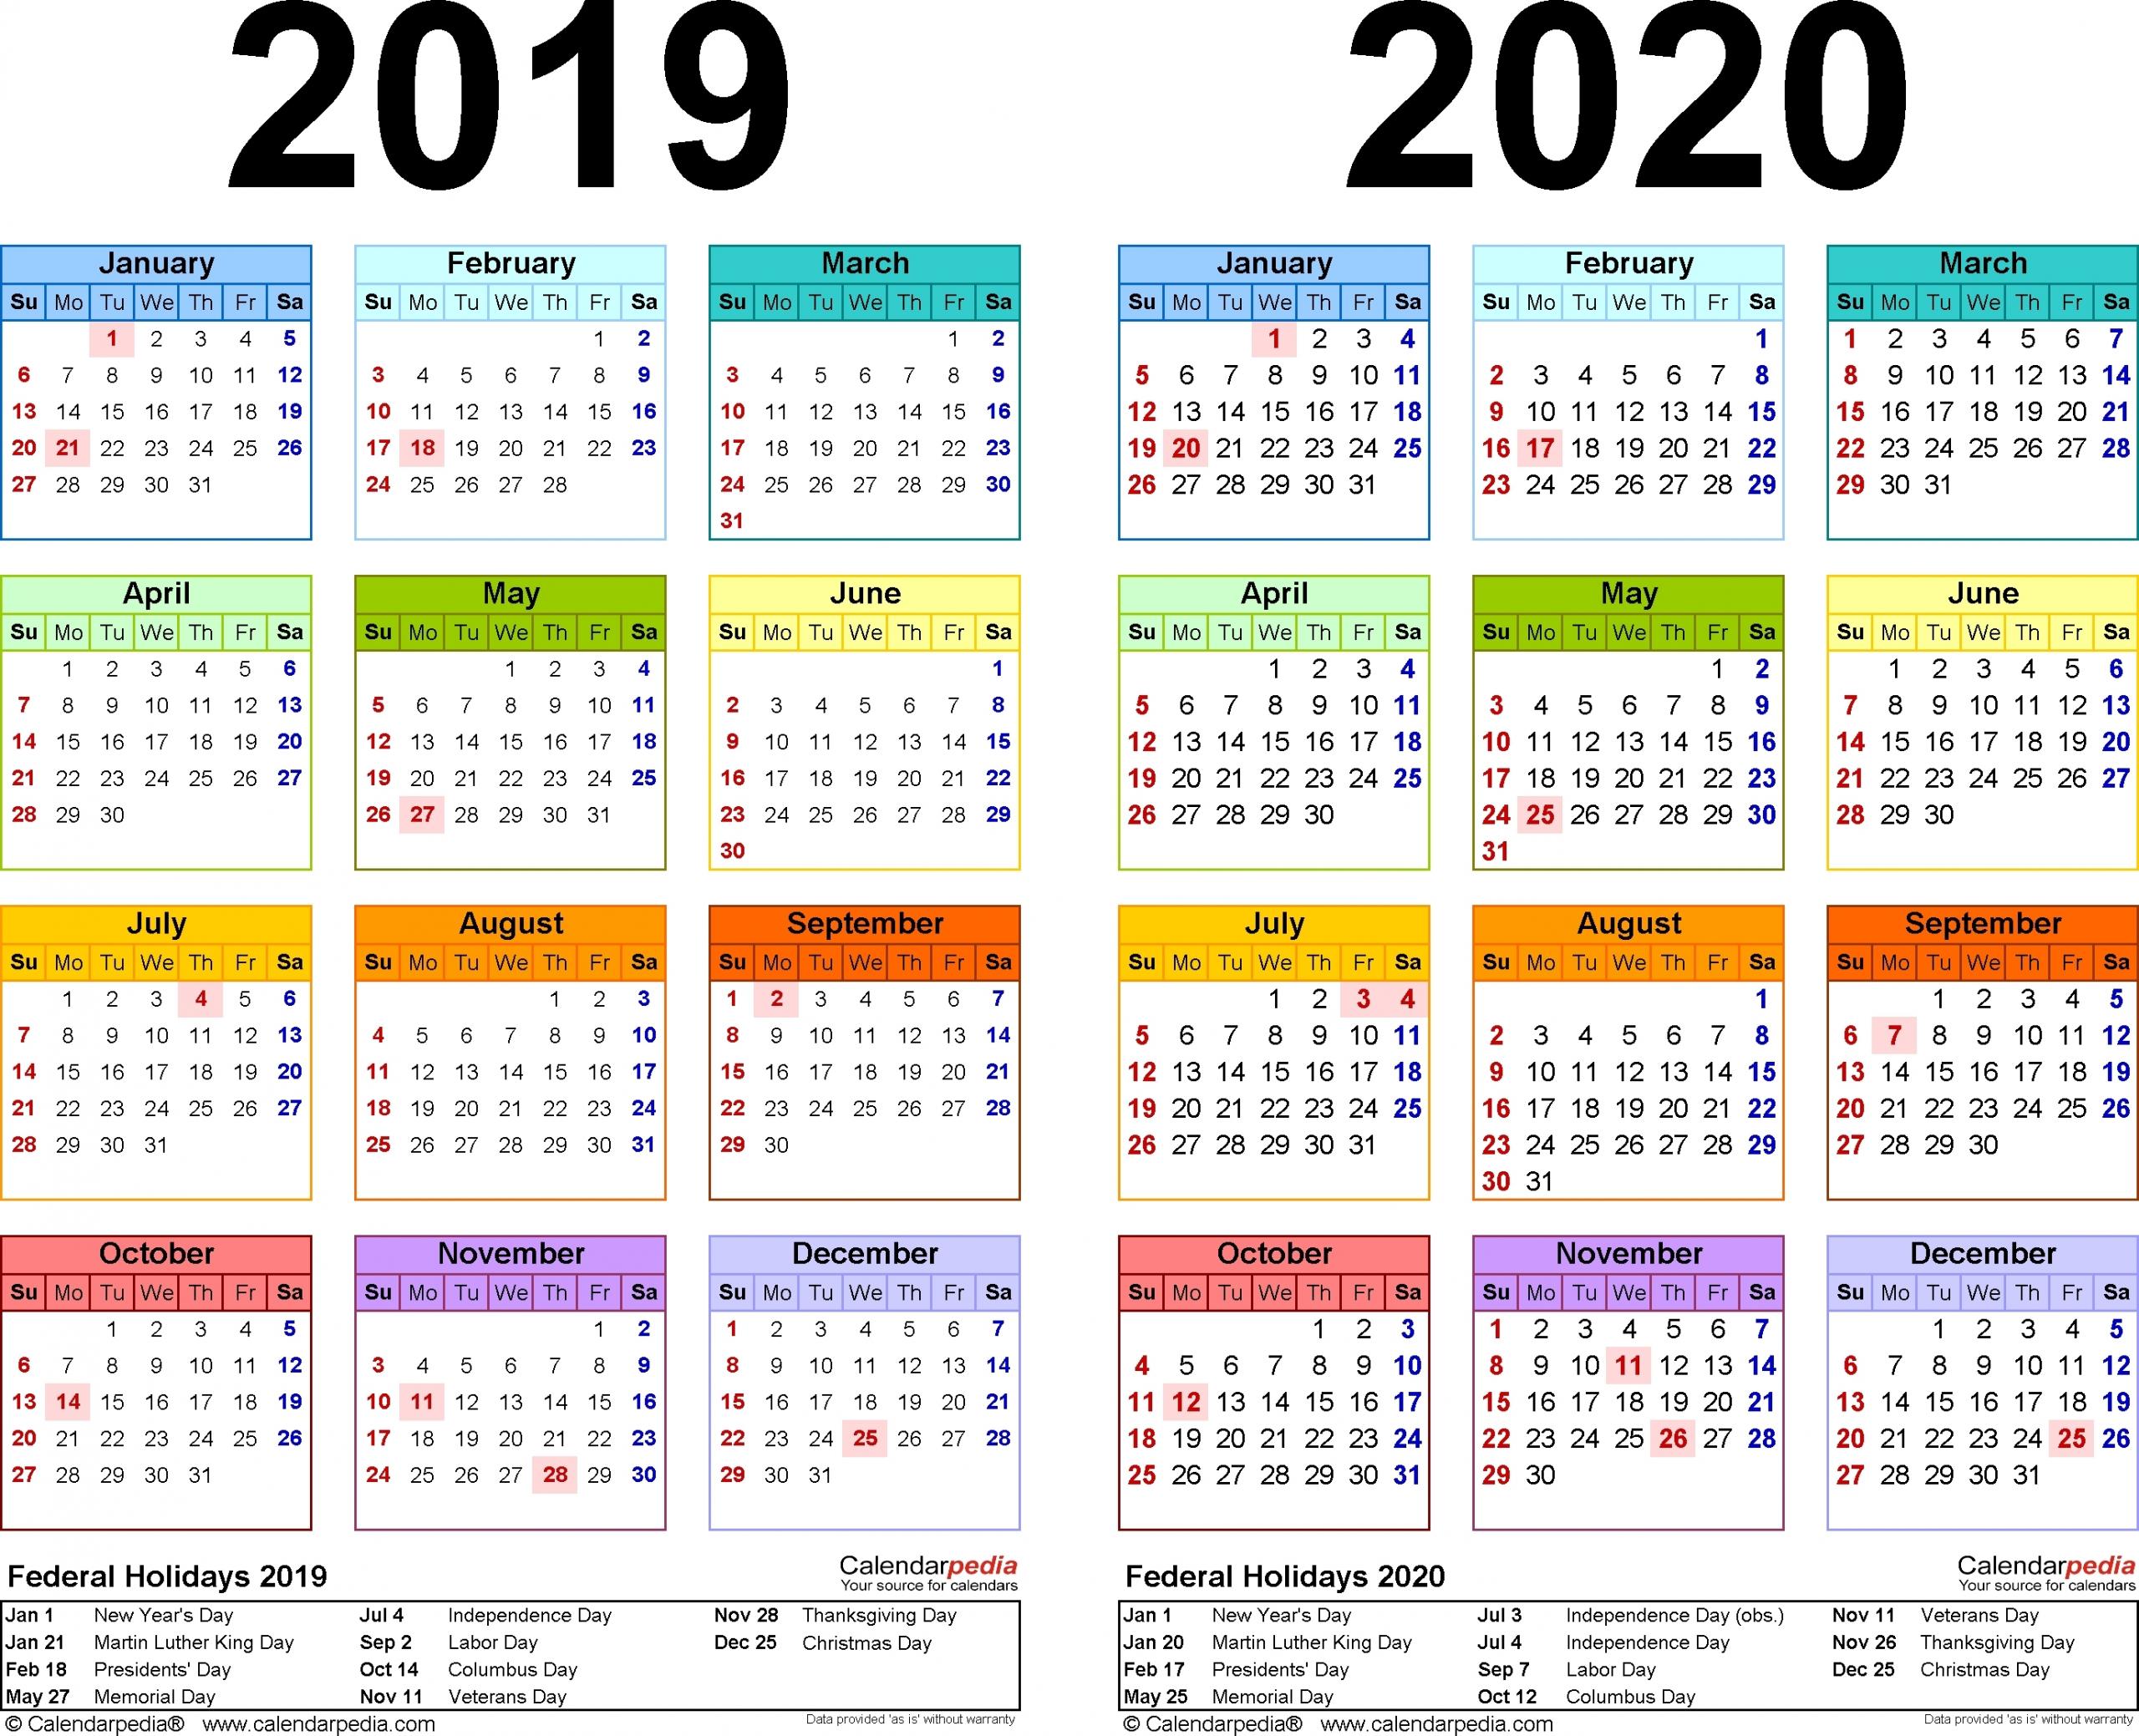 Perpetual Depo Provera Calculator  Depo Calendar October